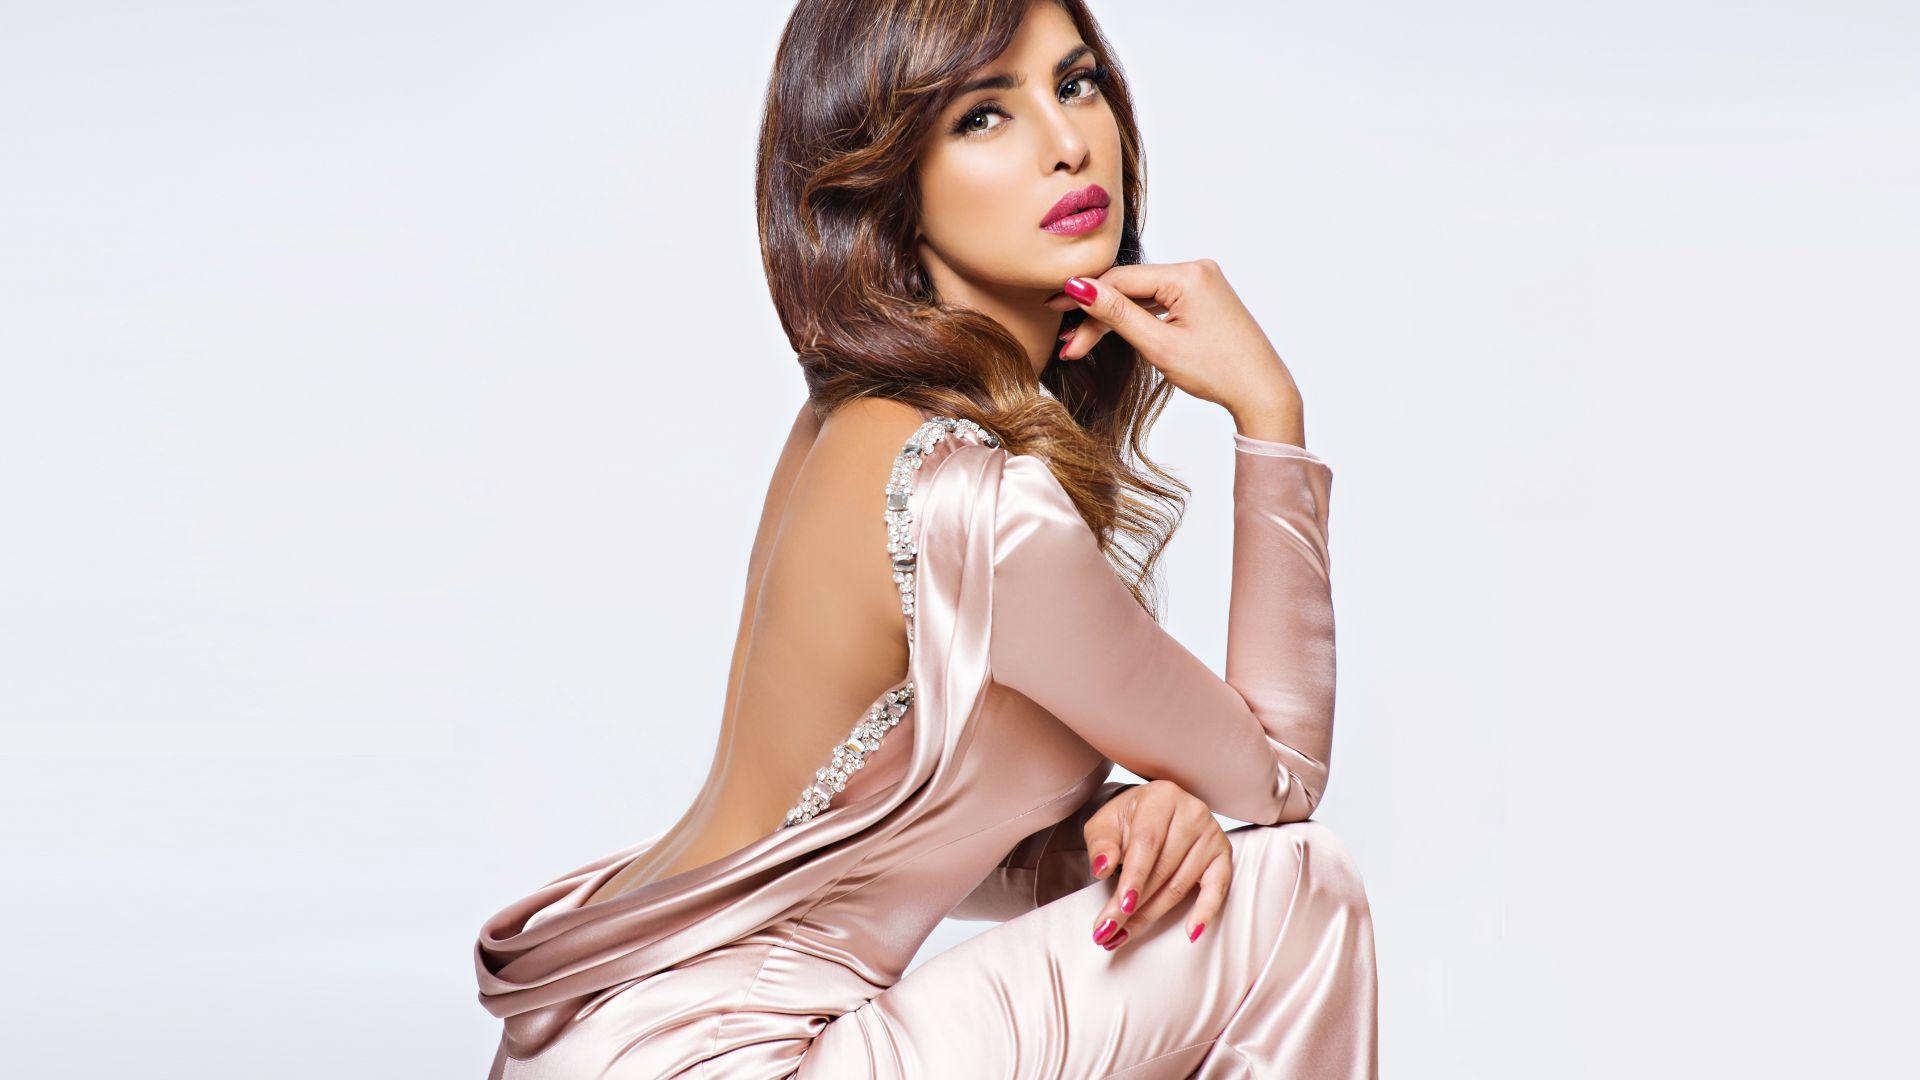 Hot pictures of priyanka Hot Pictures of Priyanka Chopra POPSUGAR Celebrity